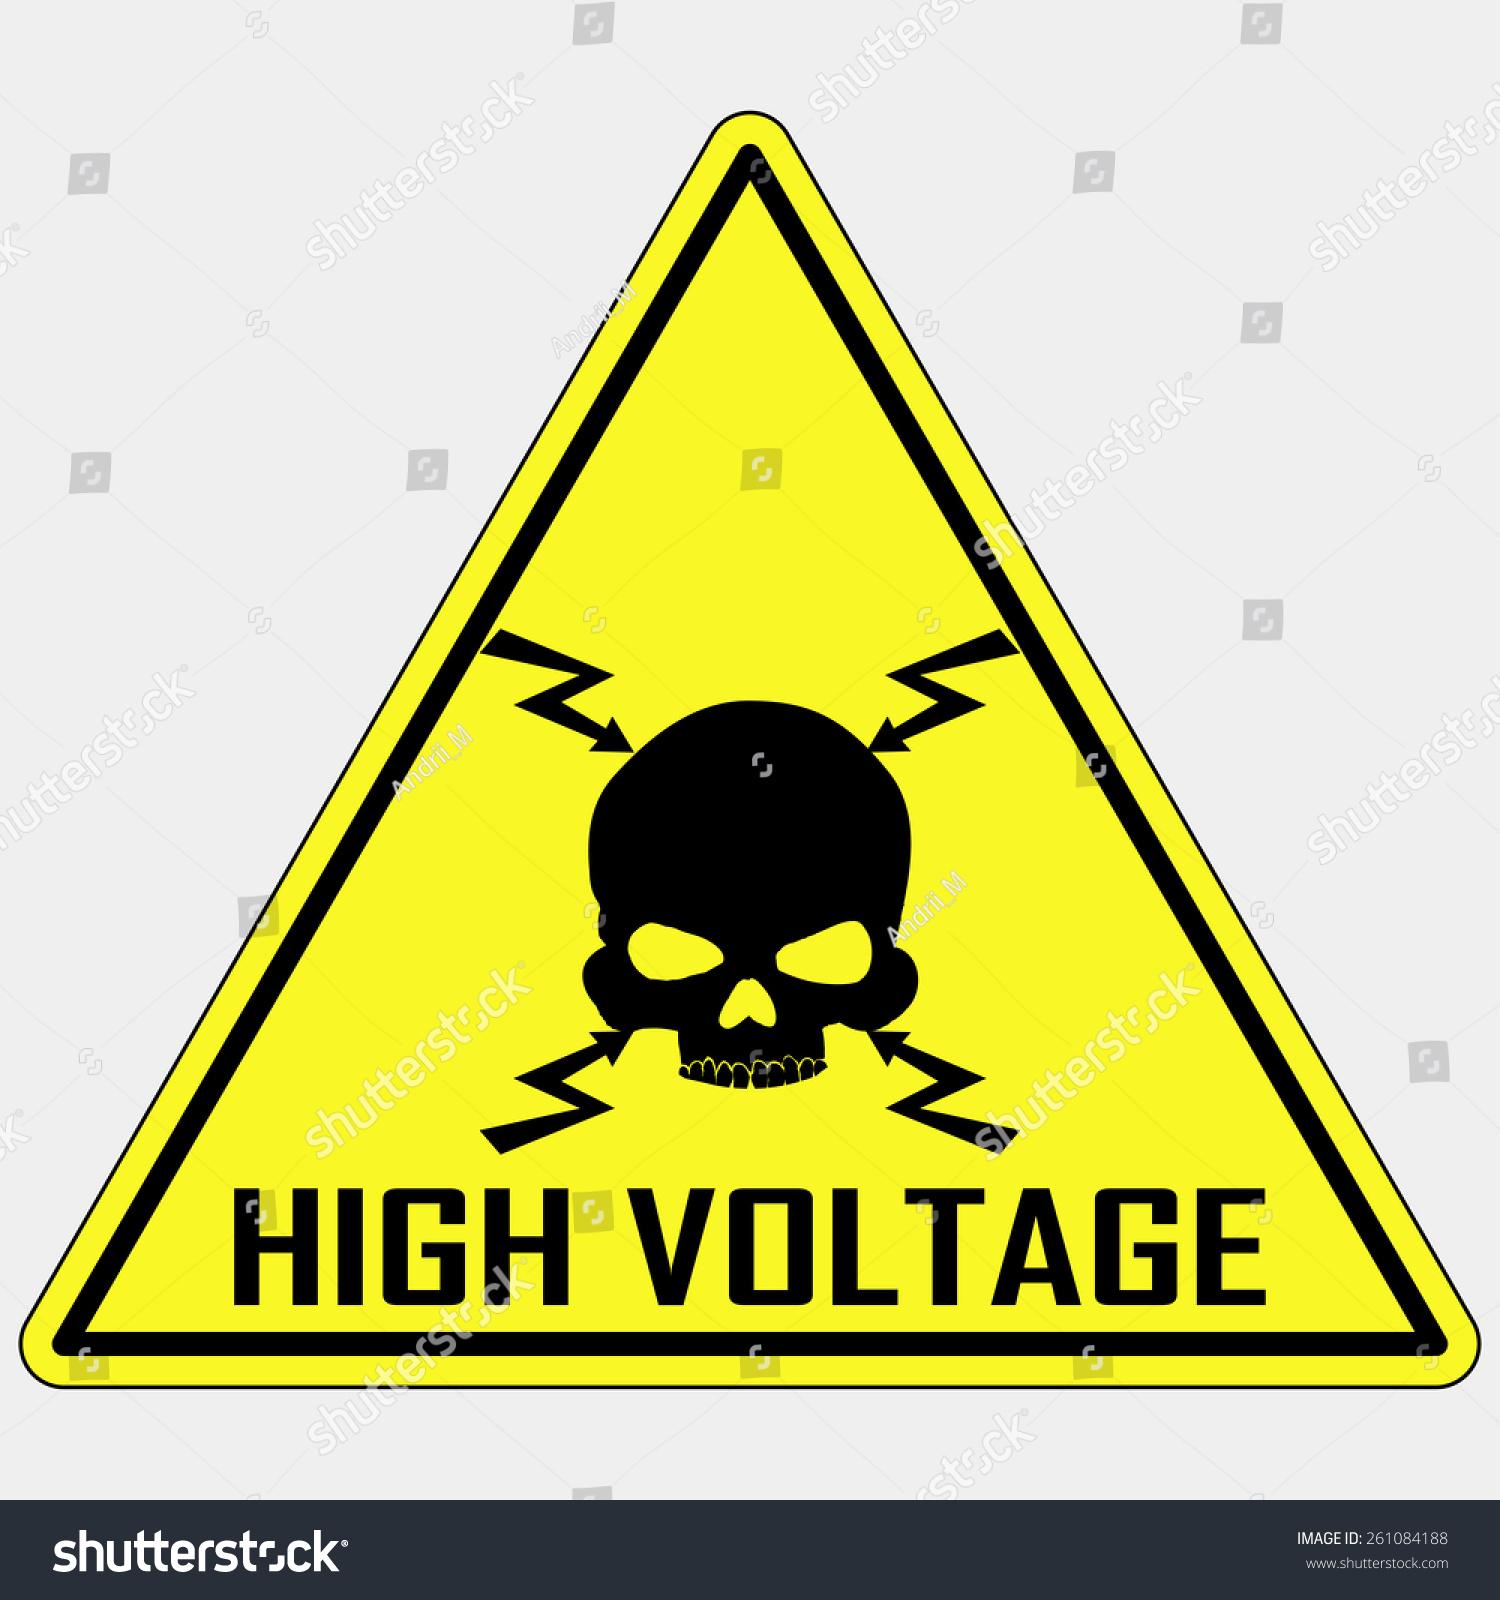 High Voltage Symbol : Danger high voltage sign electrical stock vector